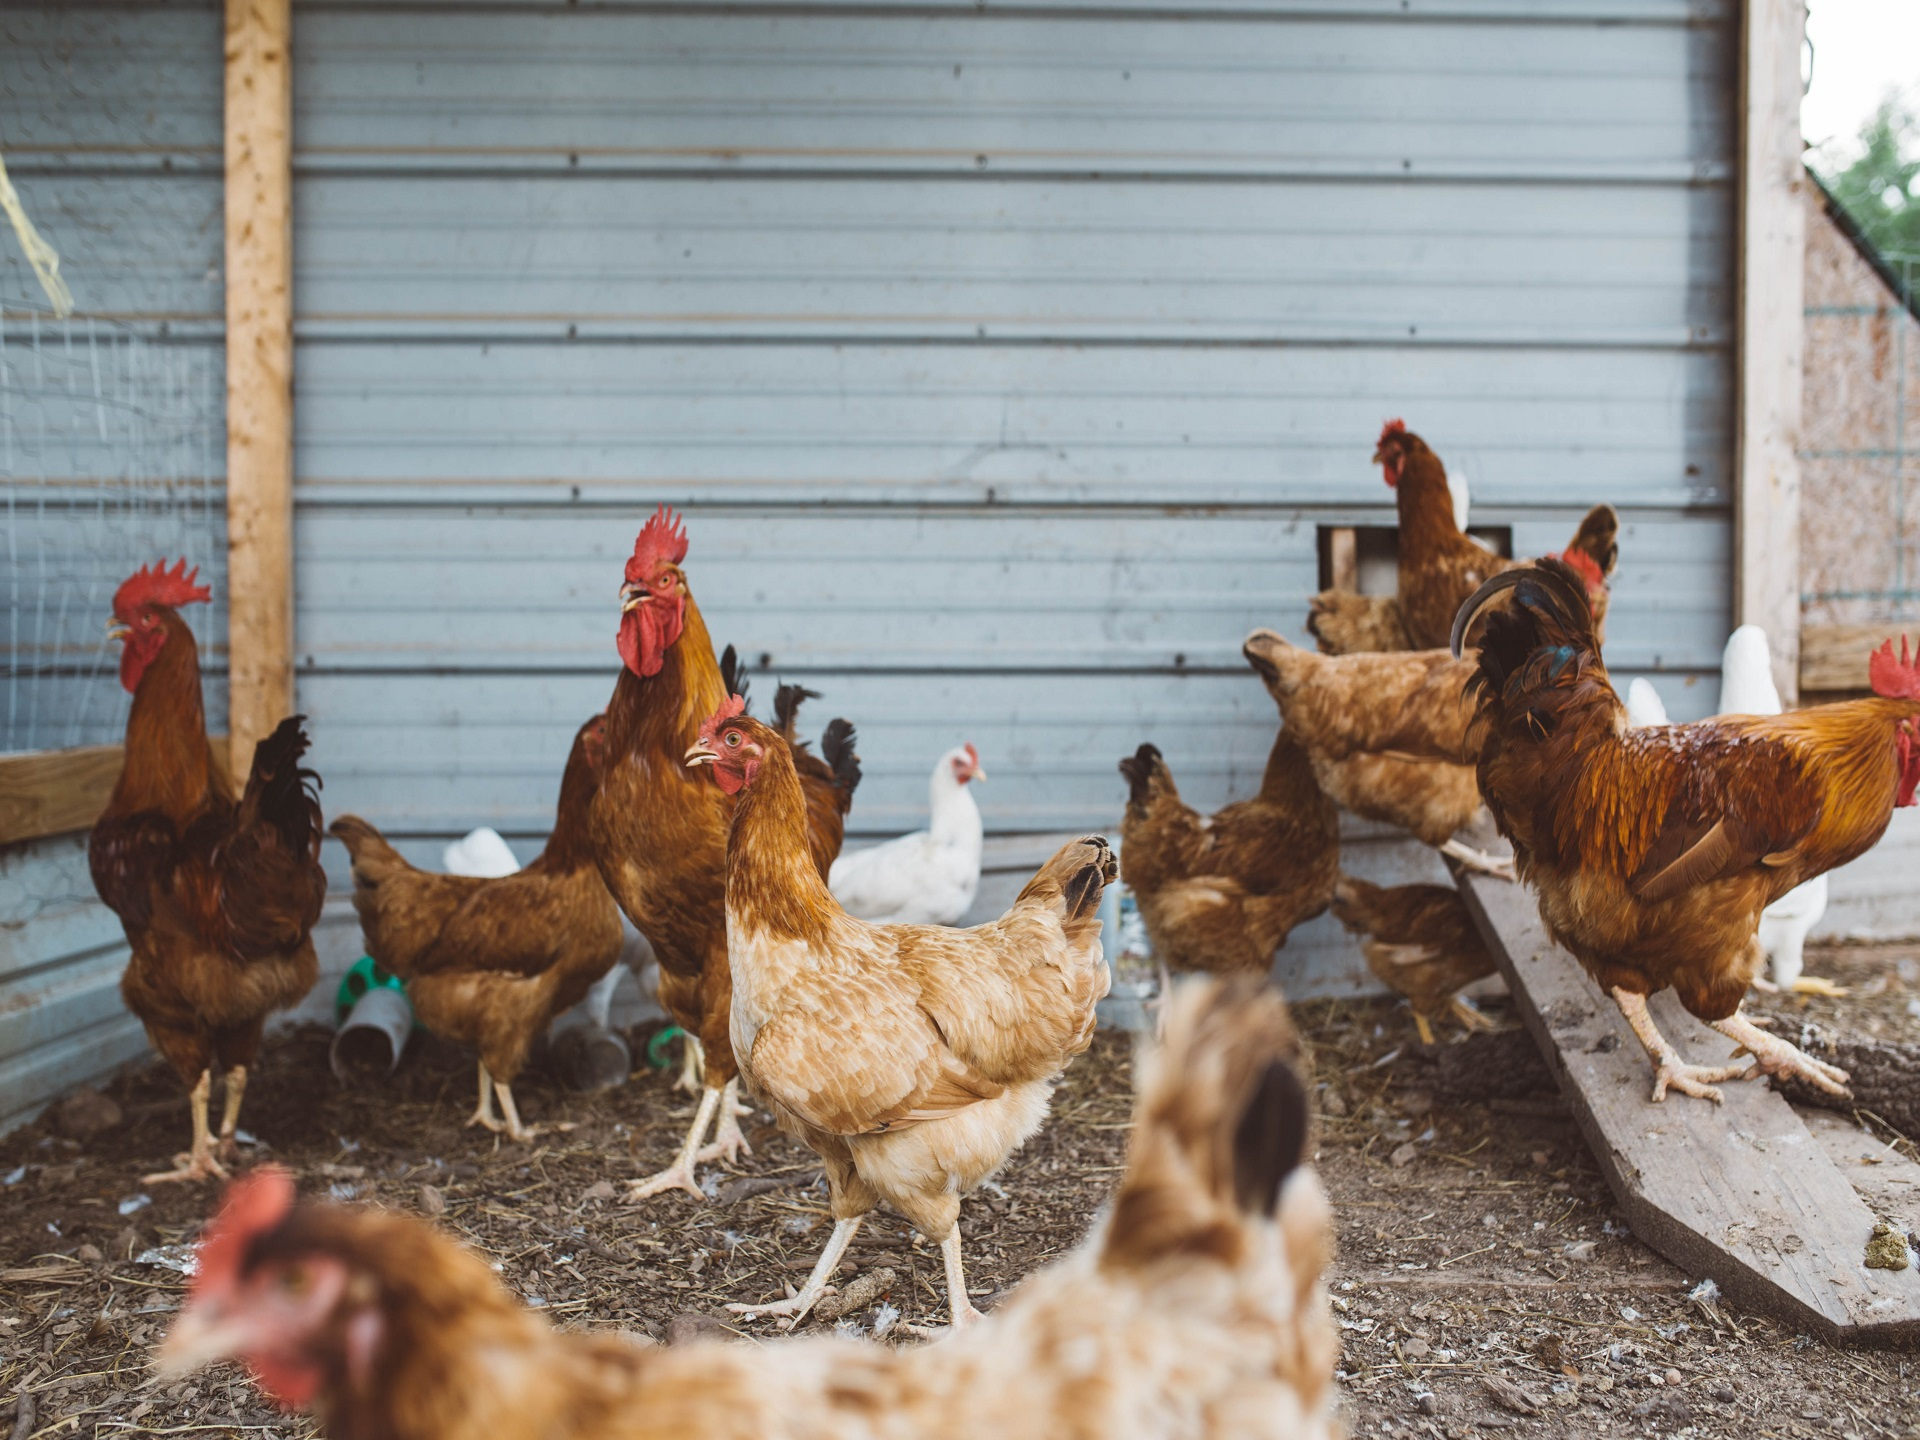 Poultry & Farm Animal